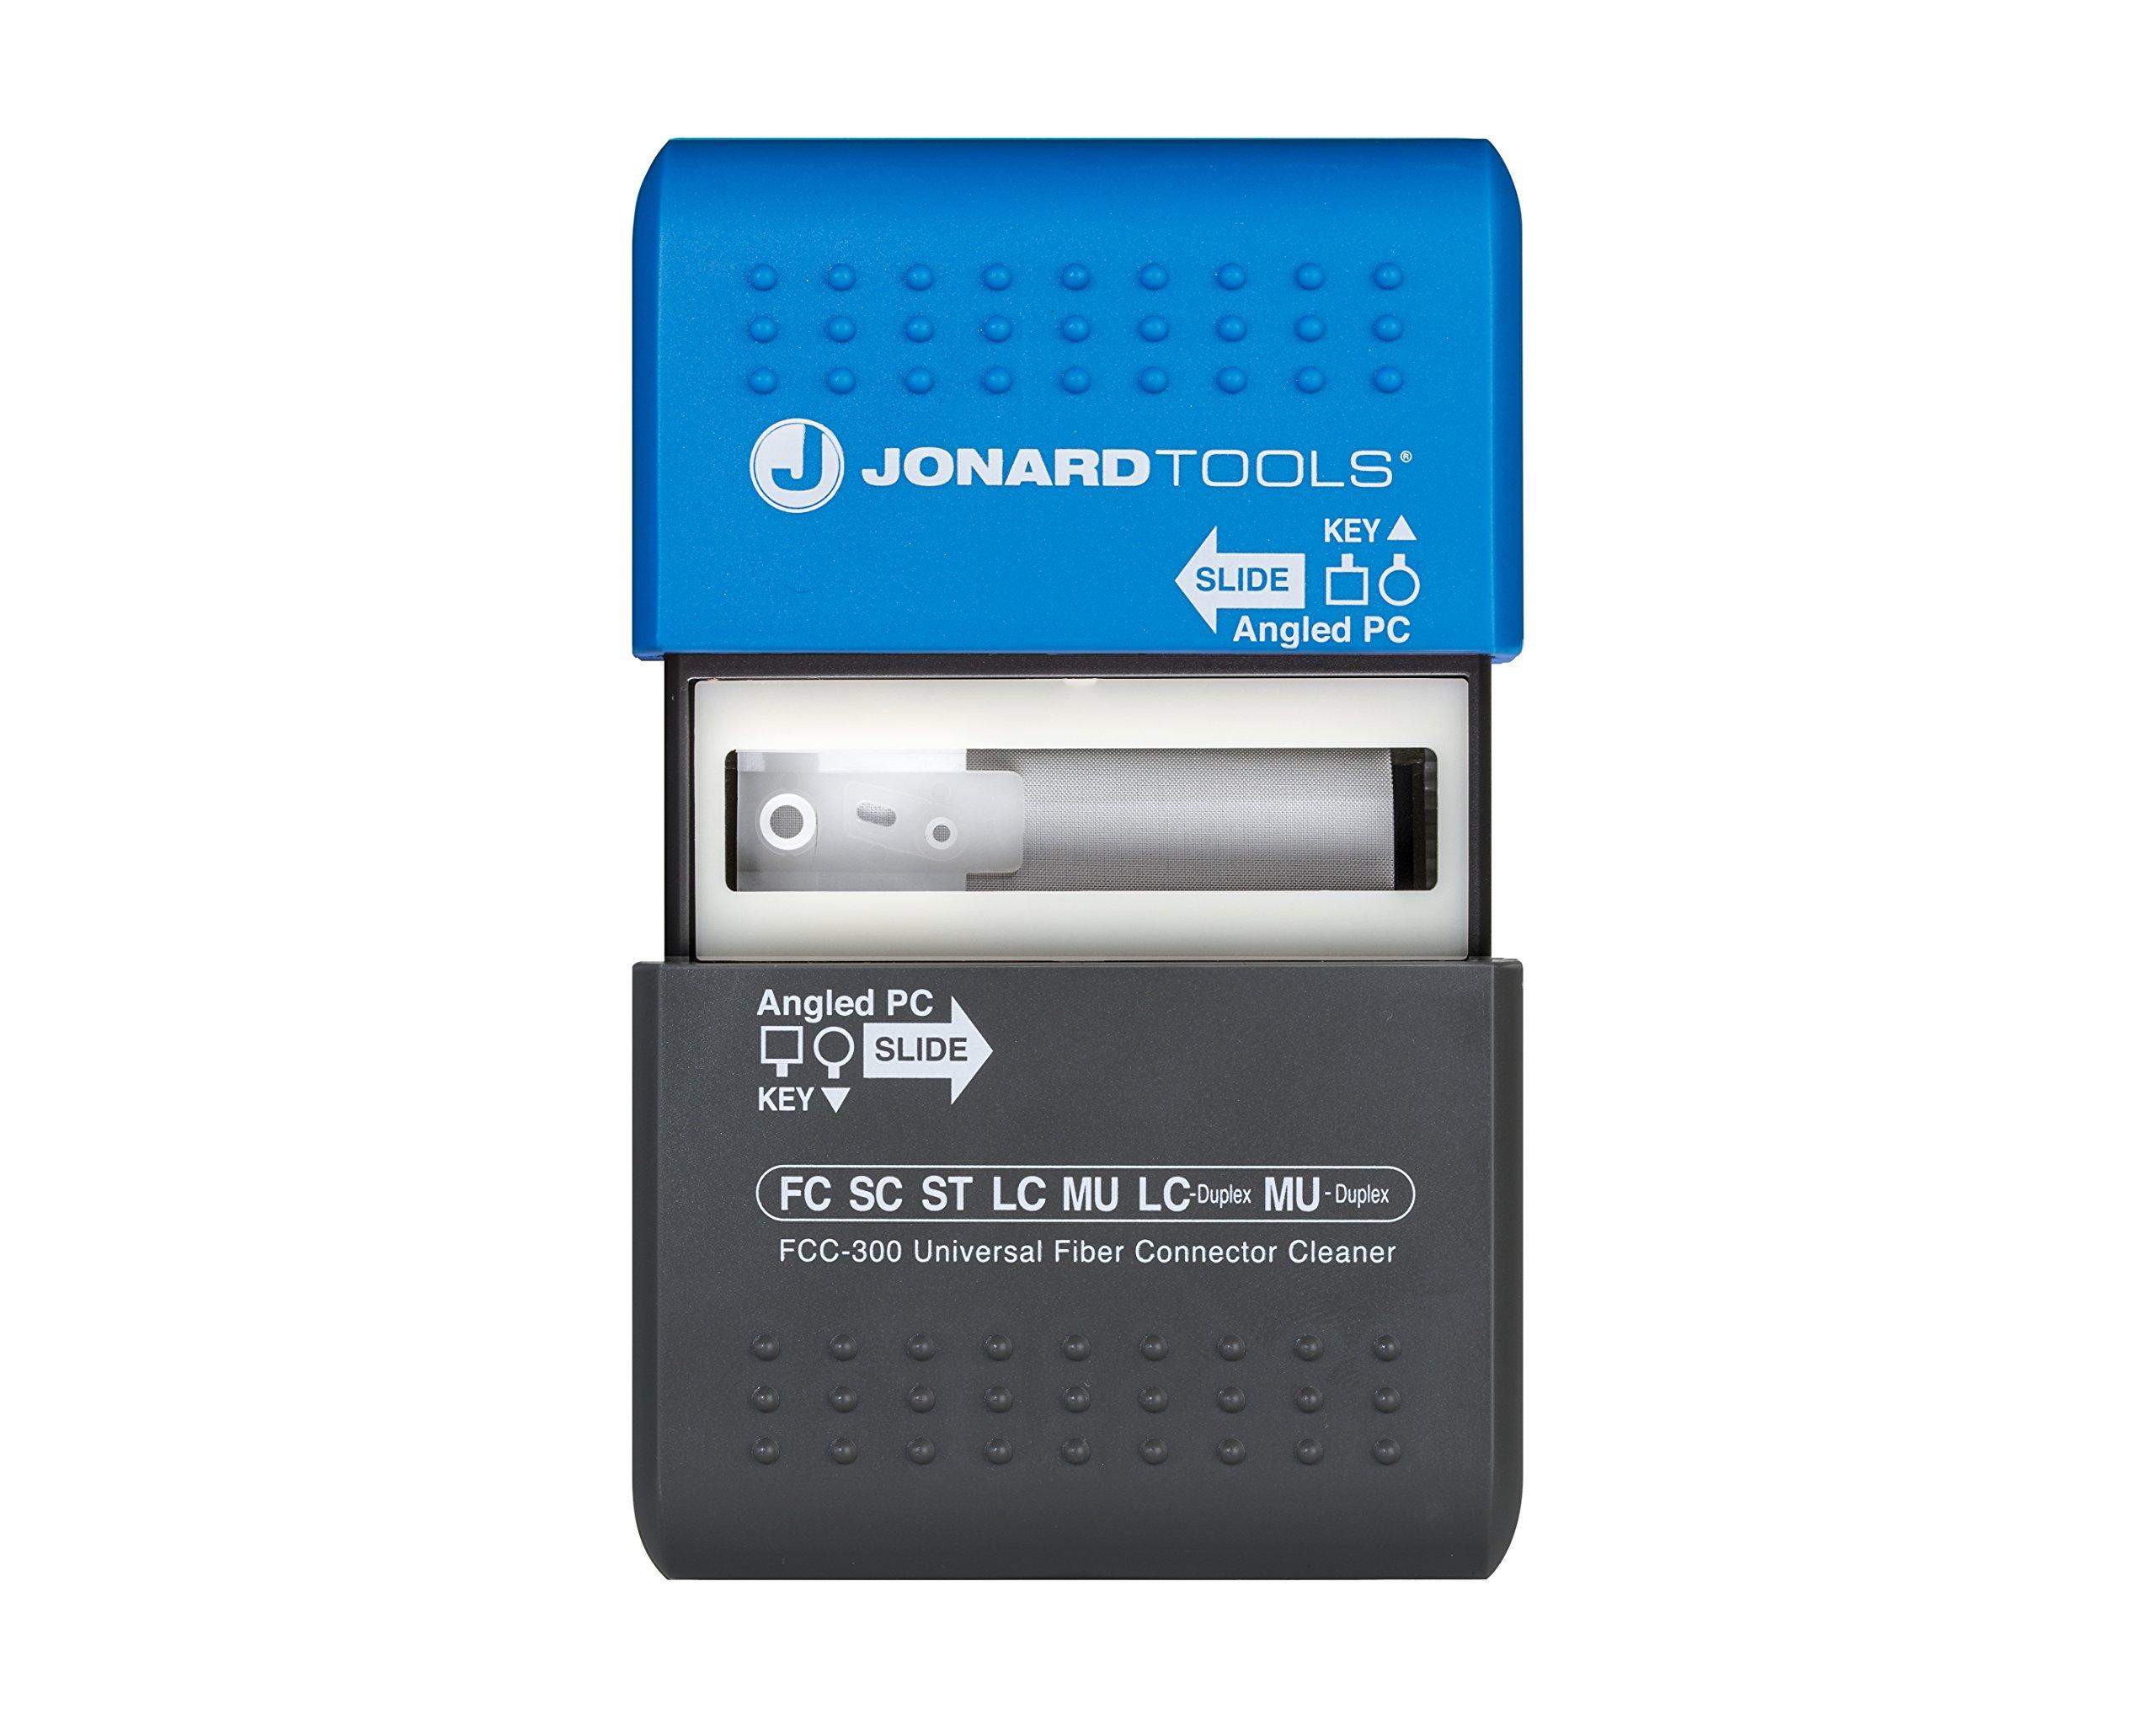 Jonard Tools FCC-300 Universal Fiber Connector Cleaner